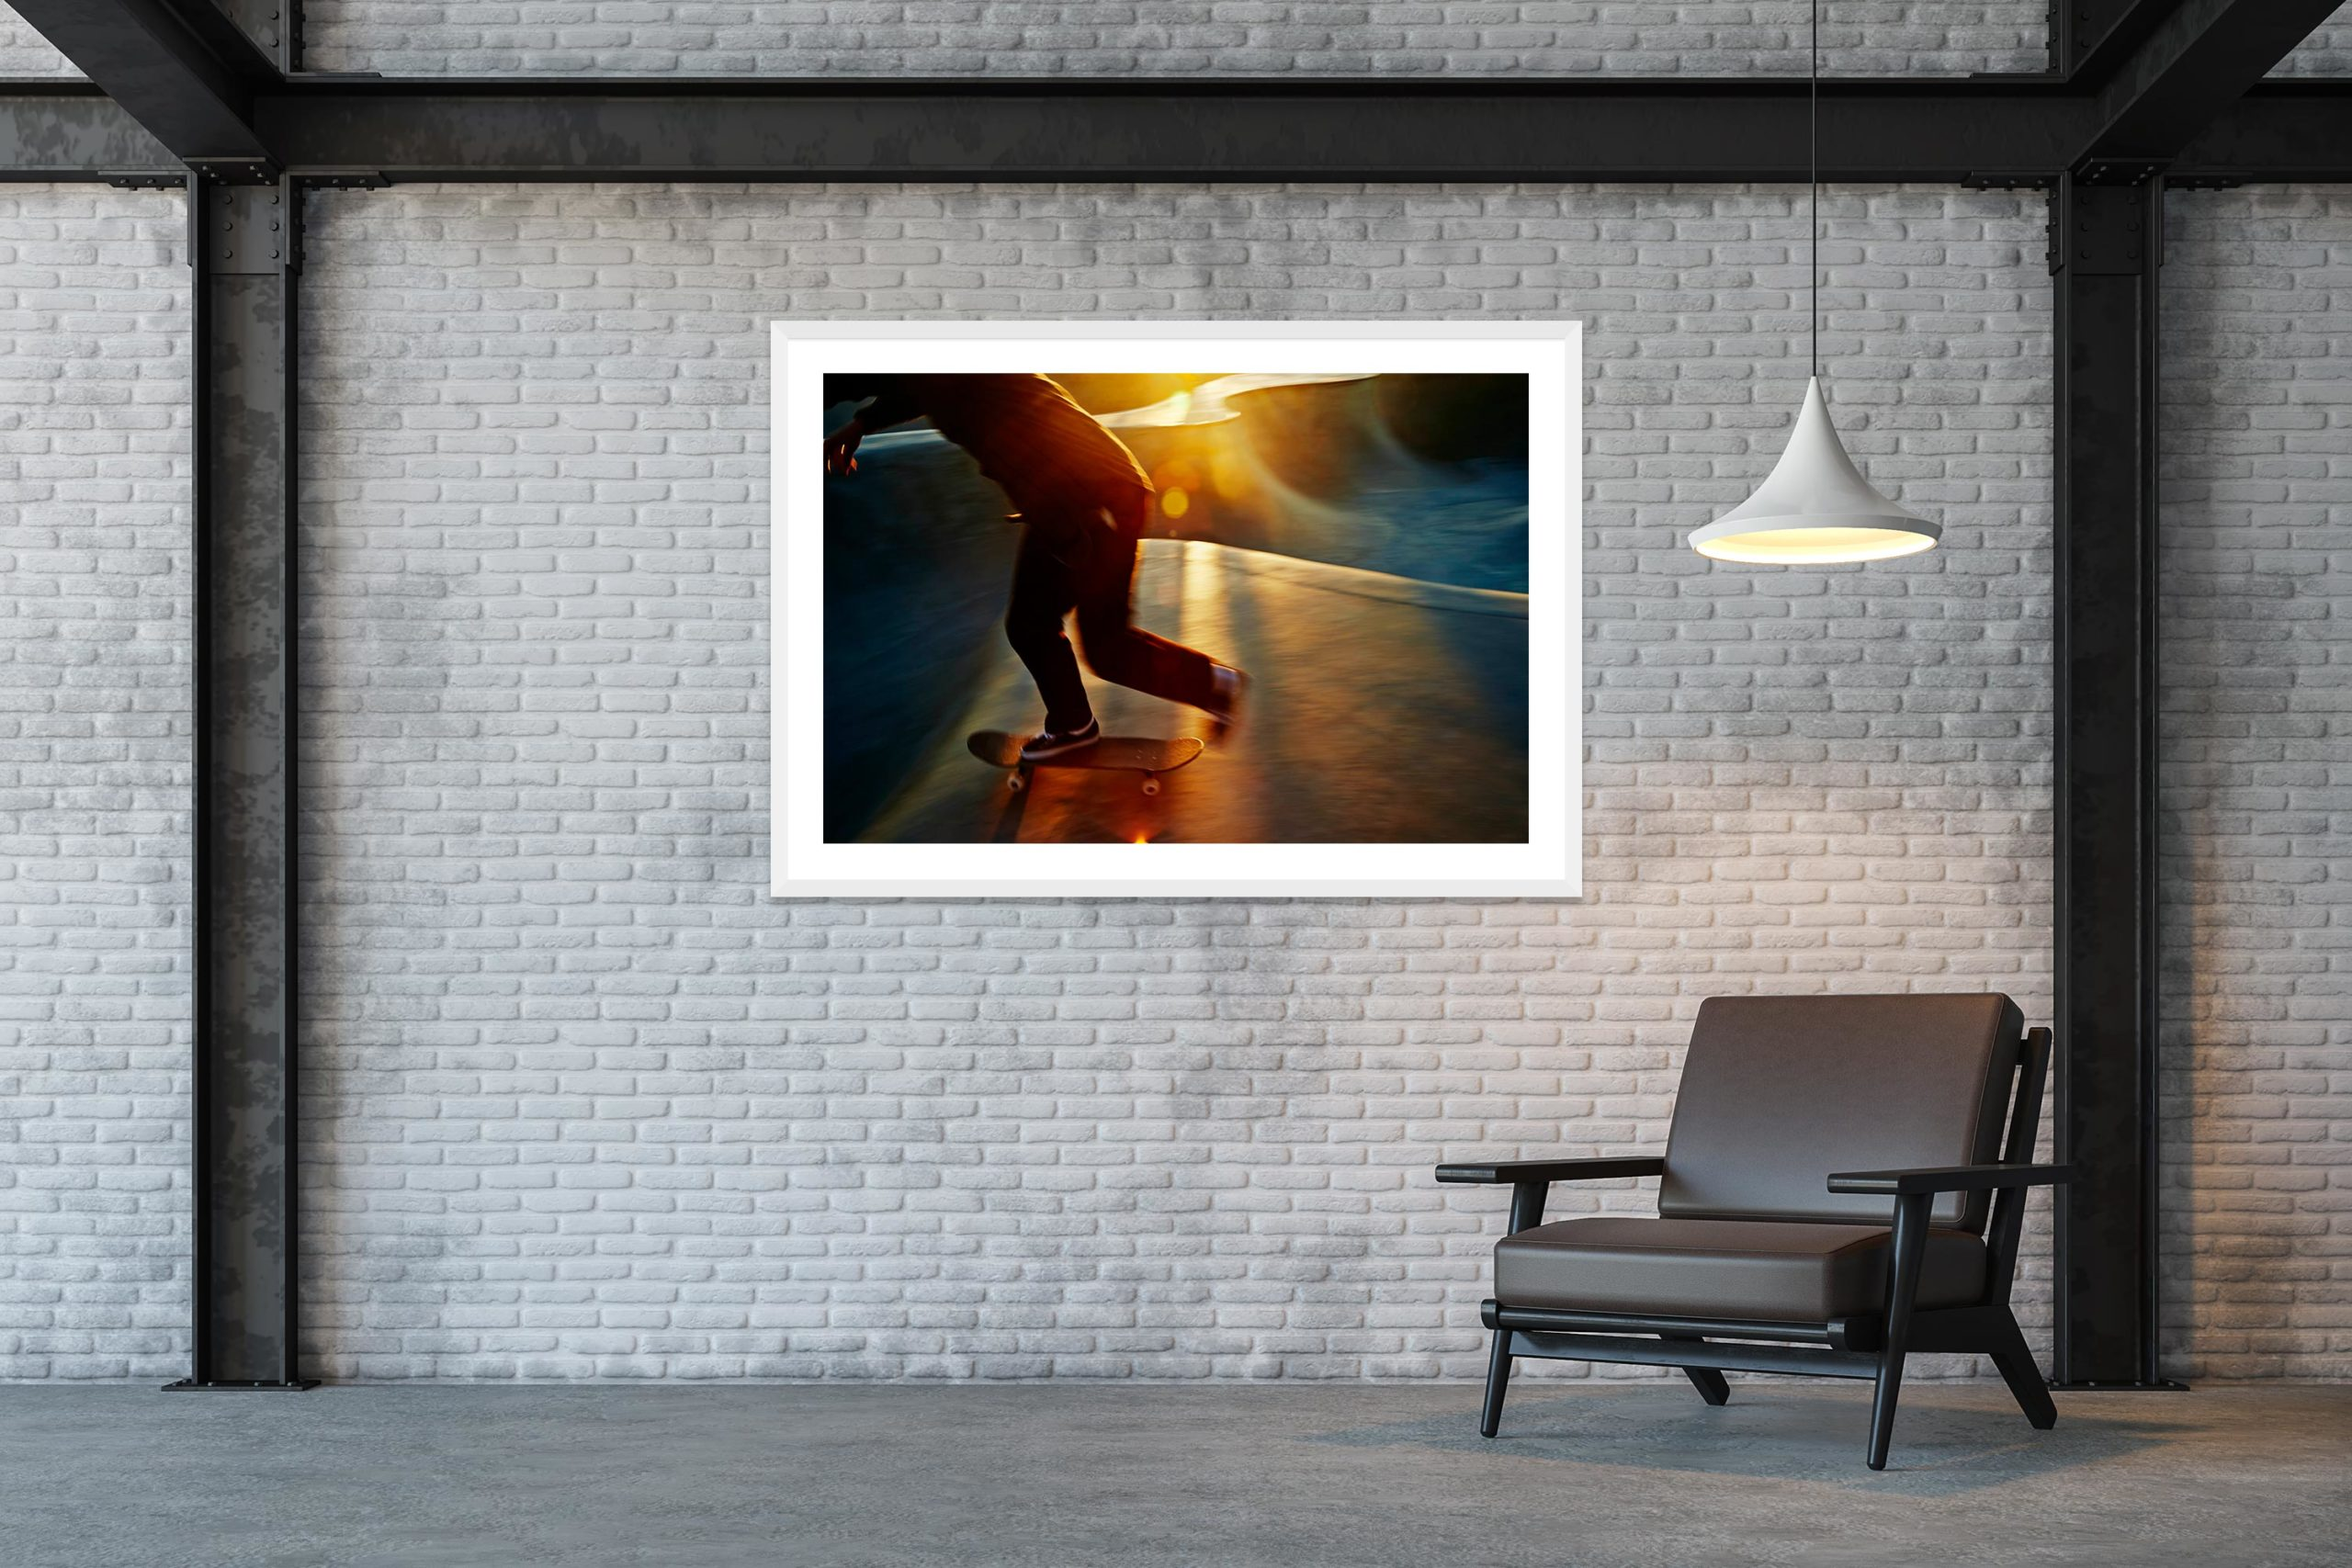 Golden Blur - White Frame - Skate Park, Venice Beach Collection - Fine Art Photography by Toby Dixon